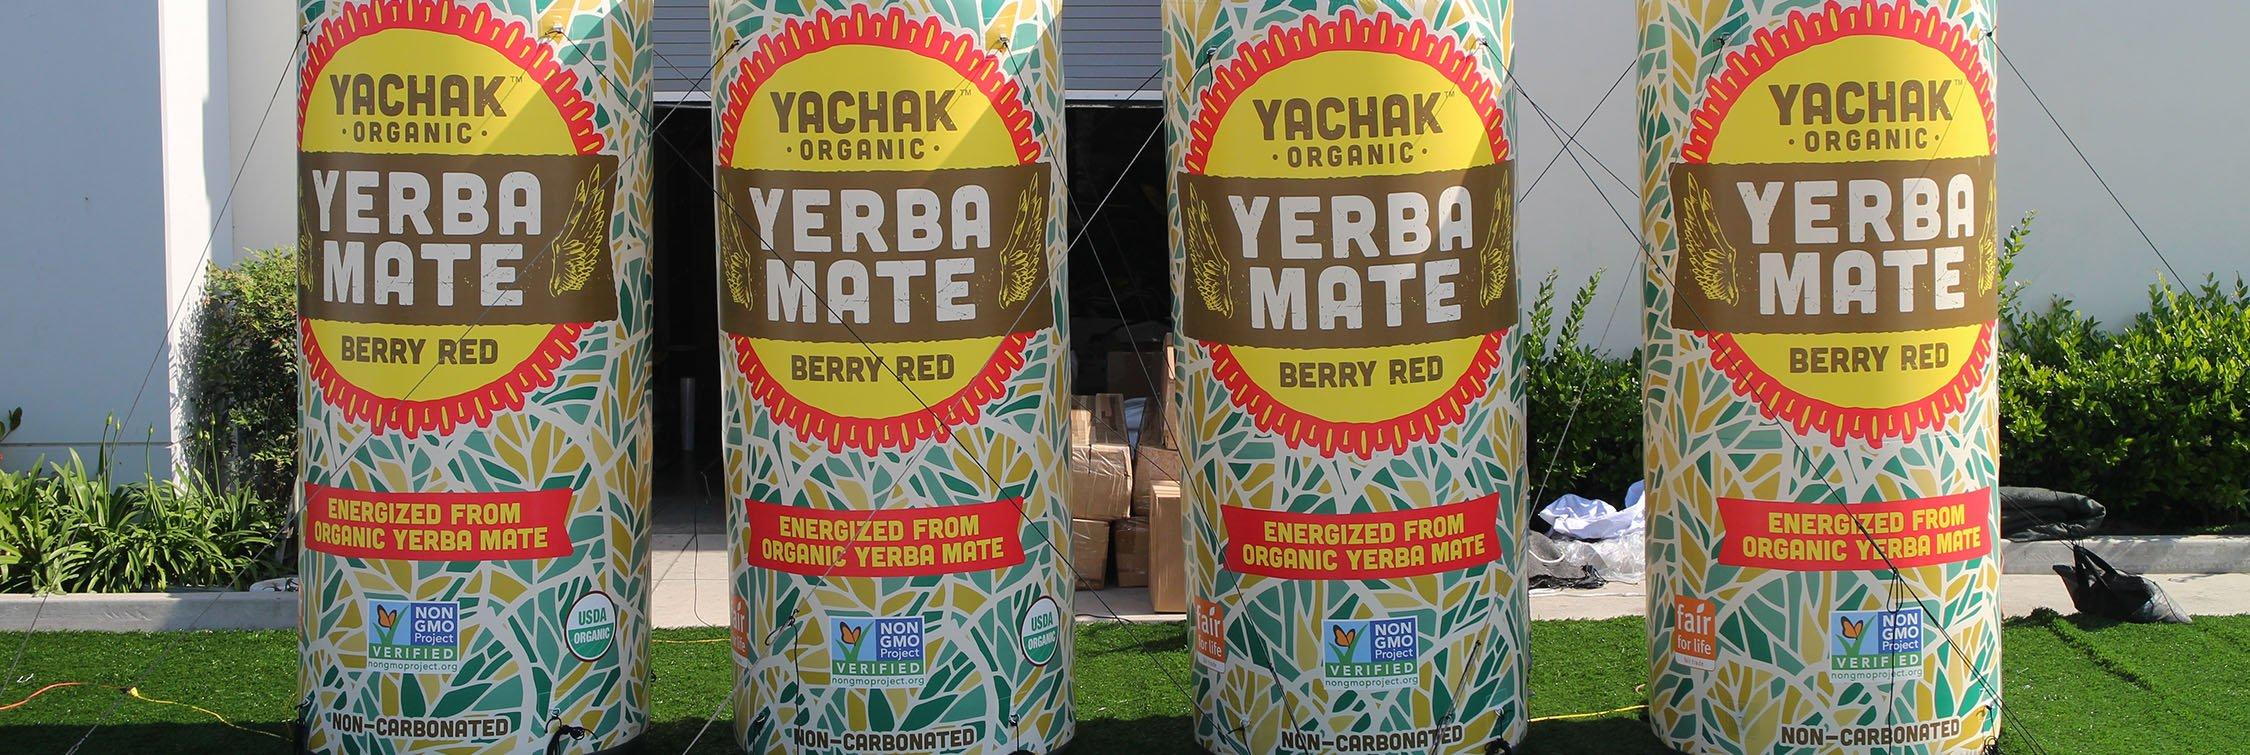 yachak-yerba-mate-inflatable-cans